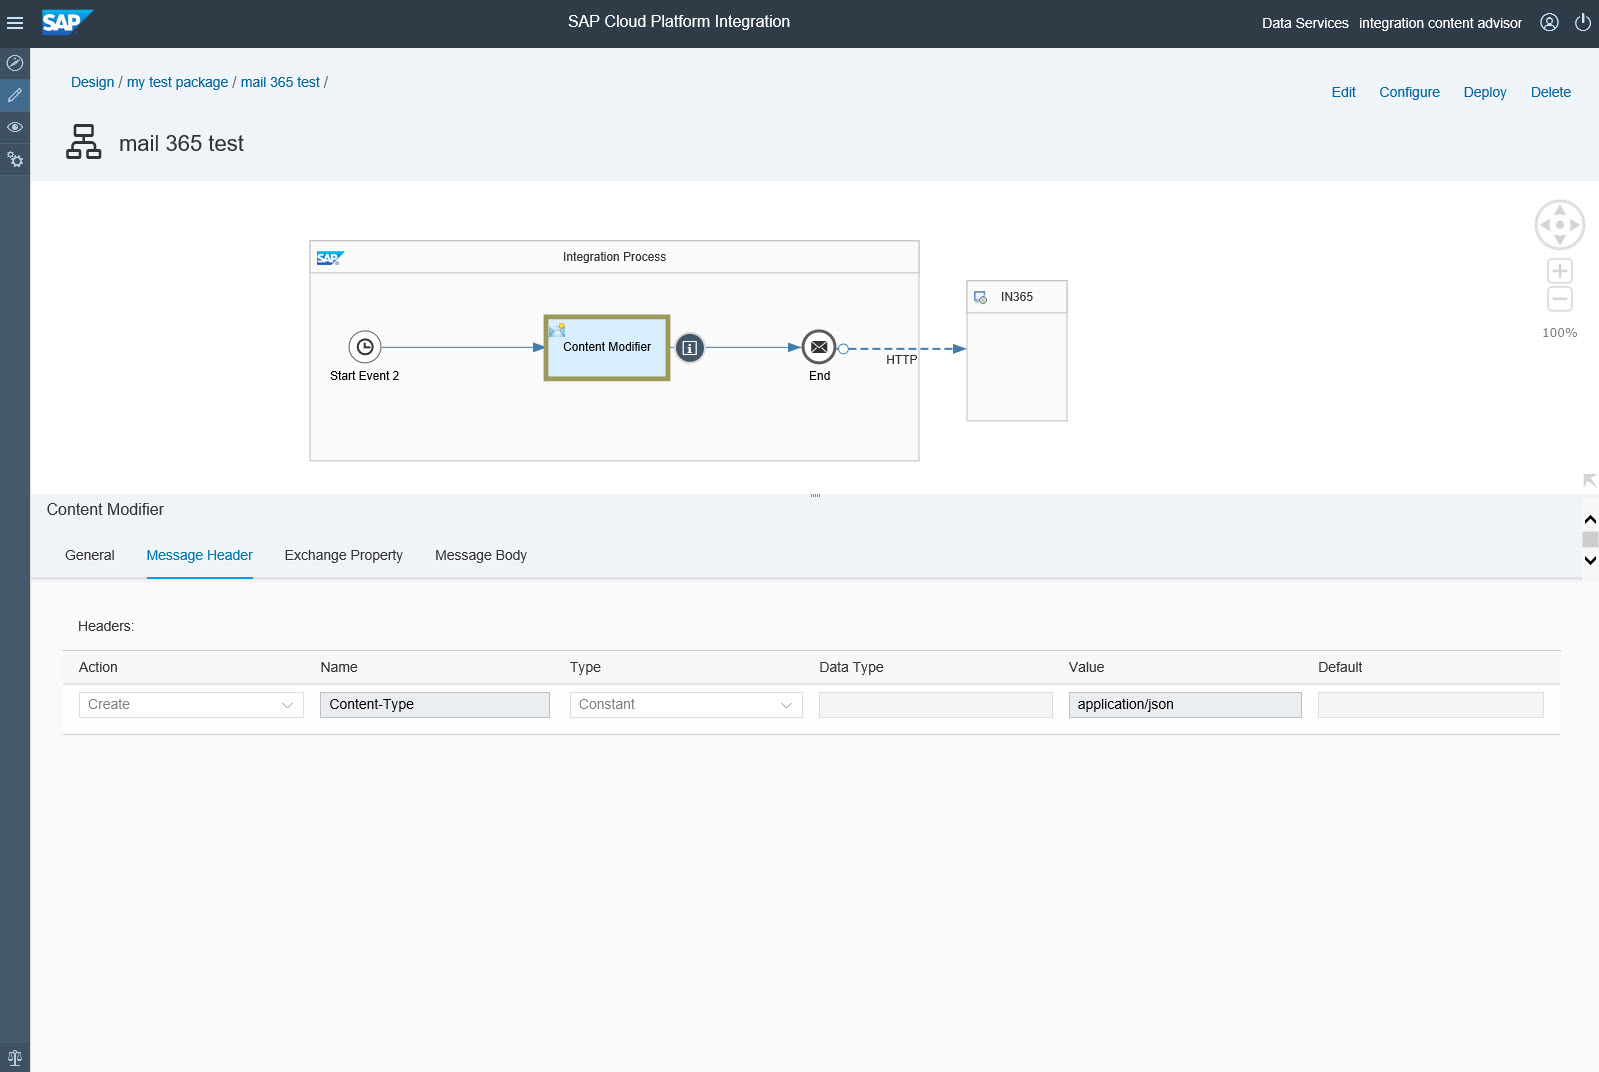 How to send a mail from SAP Cloud Platform Integration | SAP